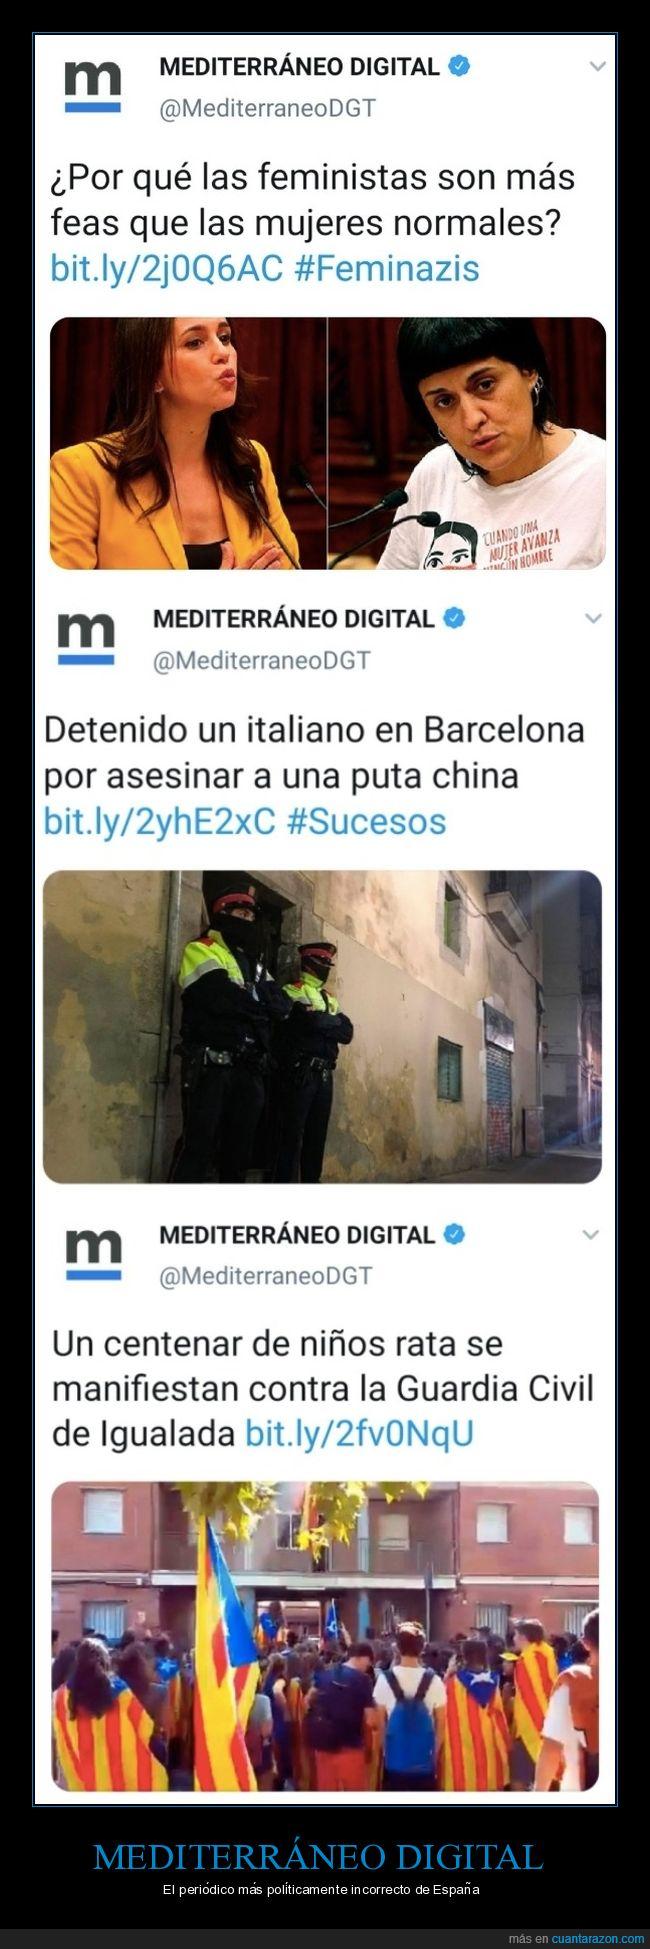 mediterráneo digital,periódico,políticamente incorreto